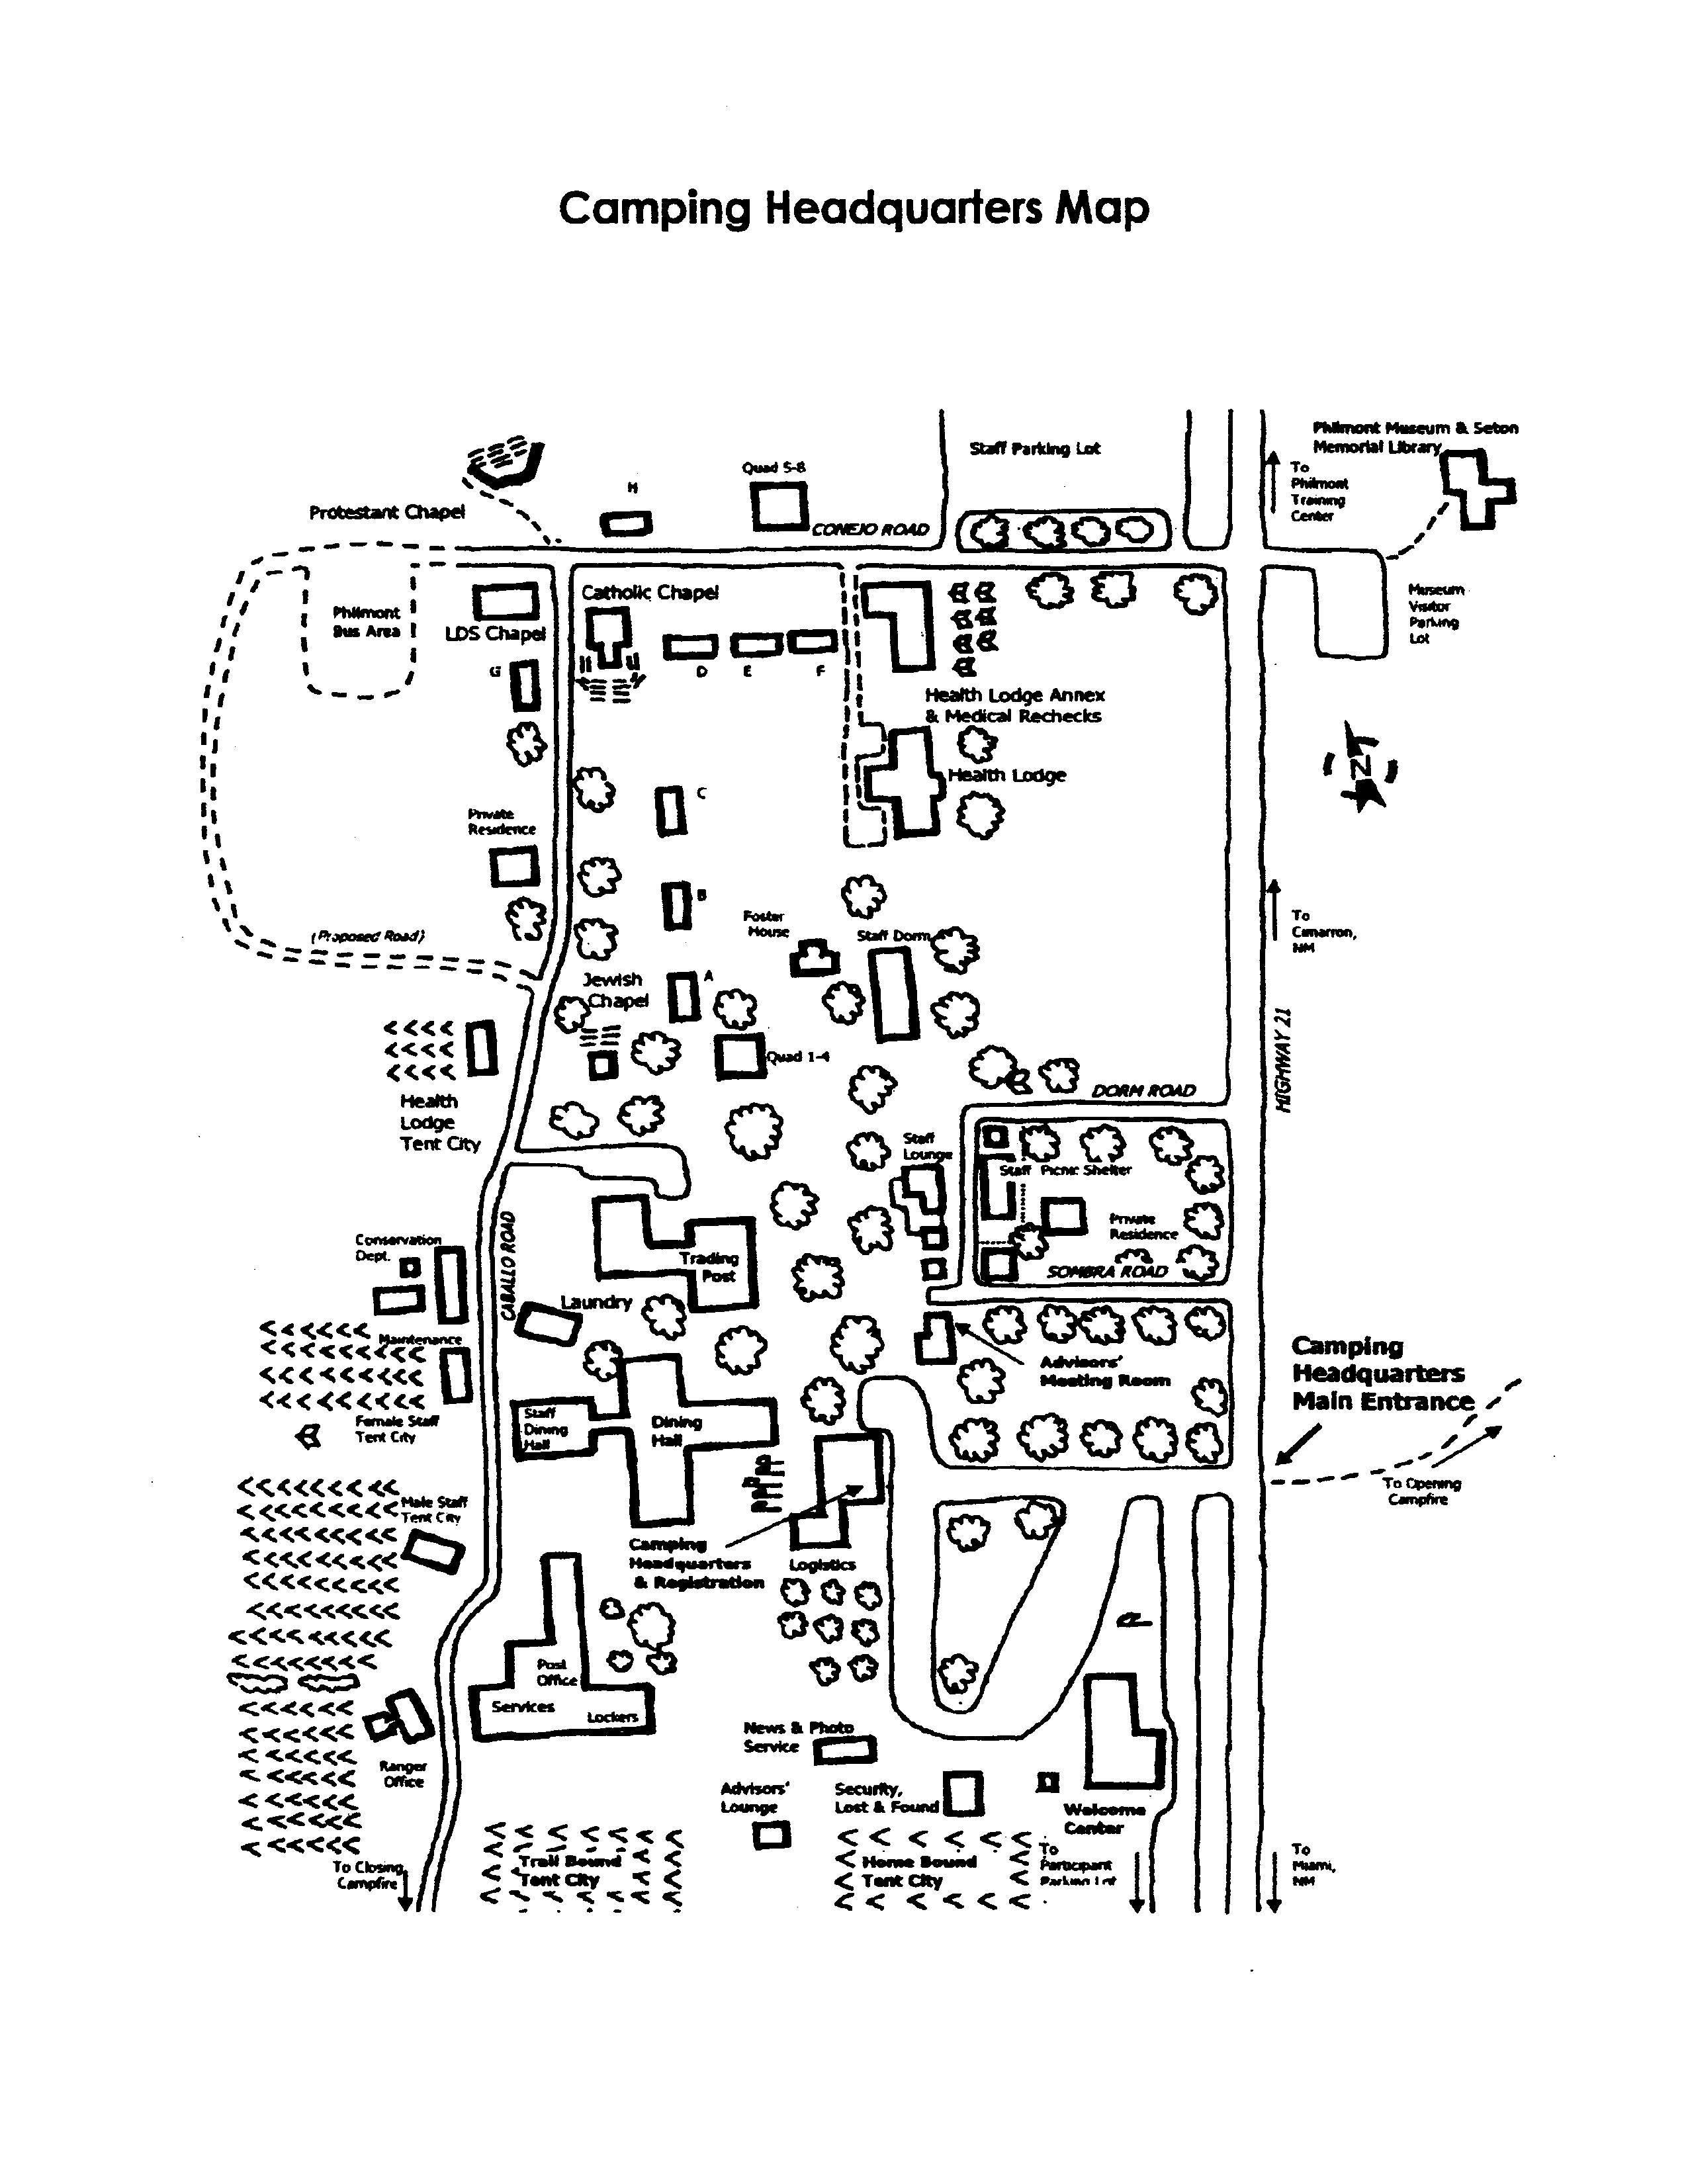 Base Camp Map